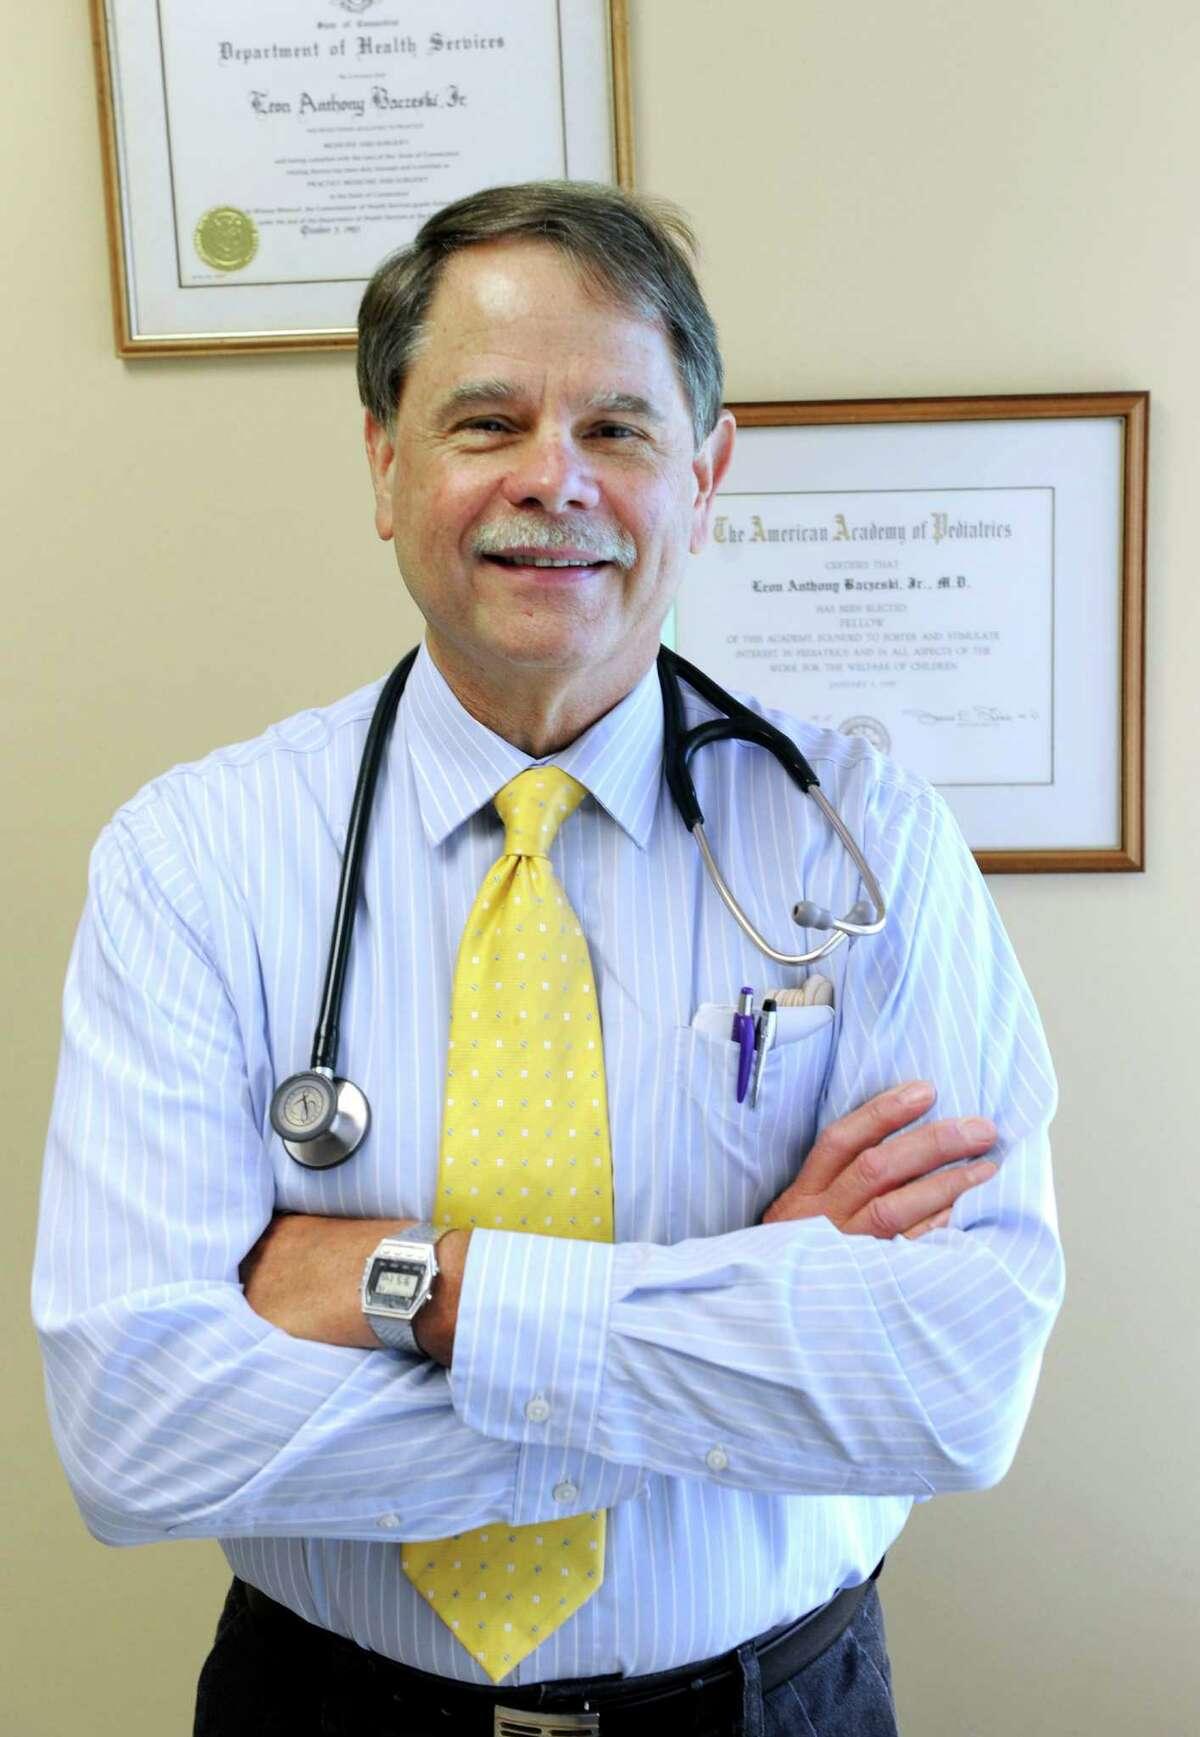 Dr. Leon Baczeski is a Danbury pediatrician with Pediatric Associates of Western Connecticut.